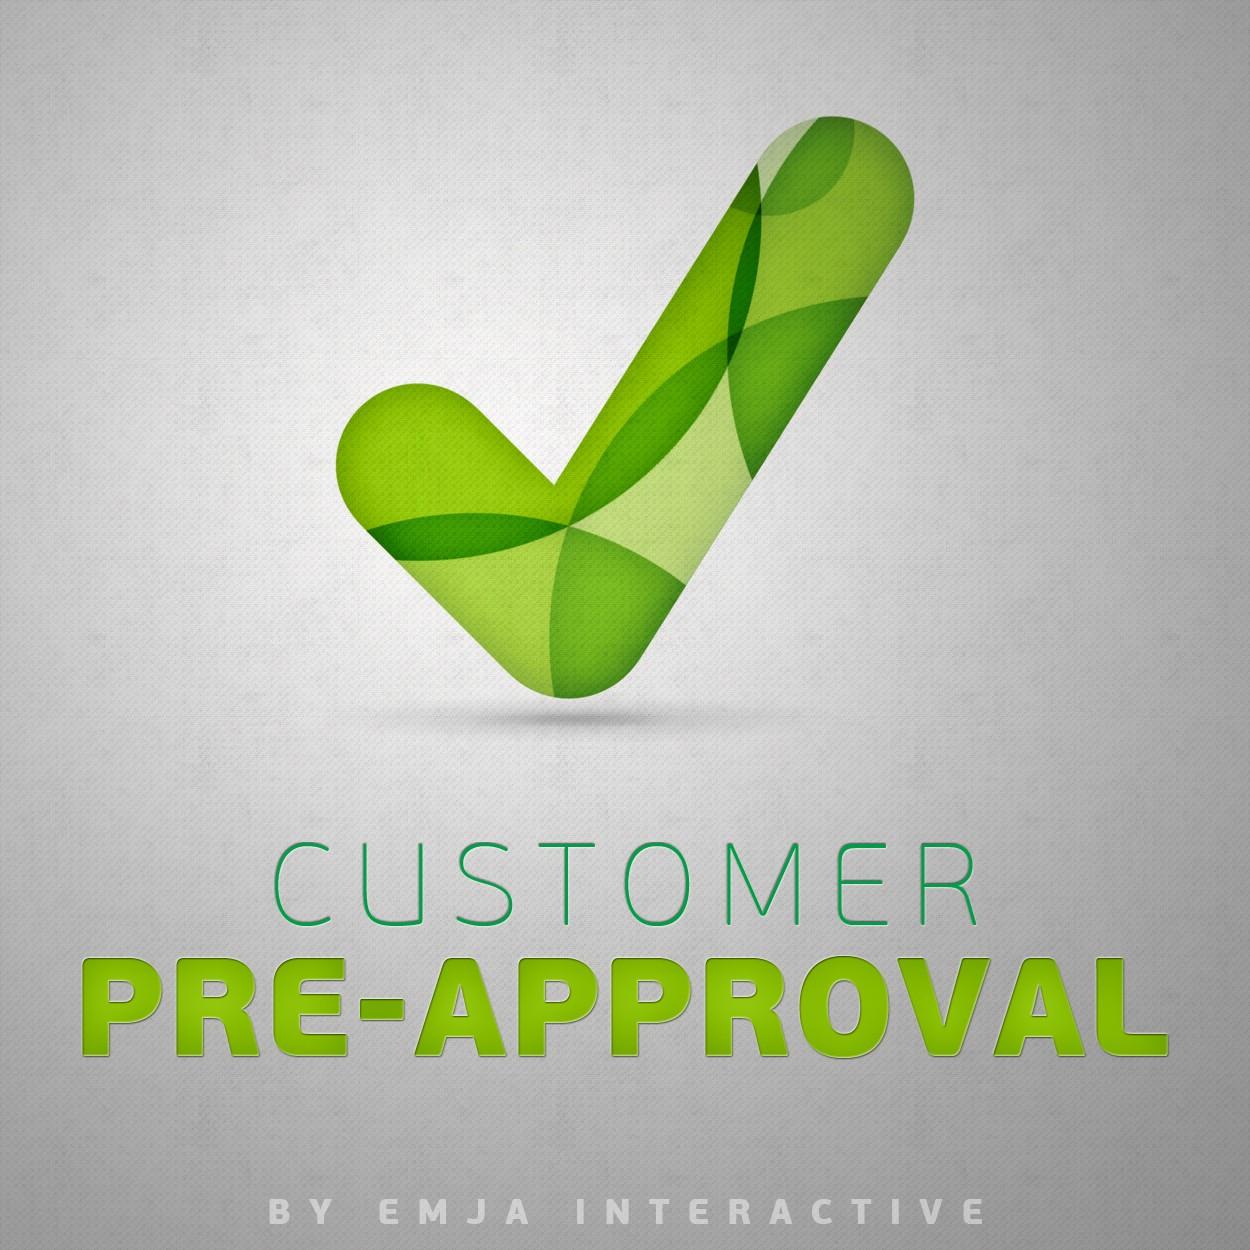 Customer Pre-Approval